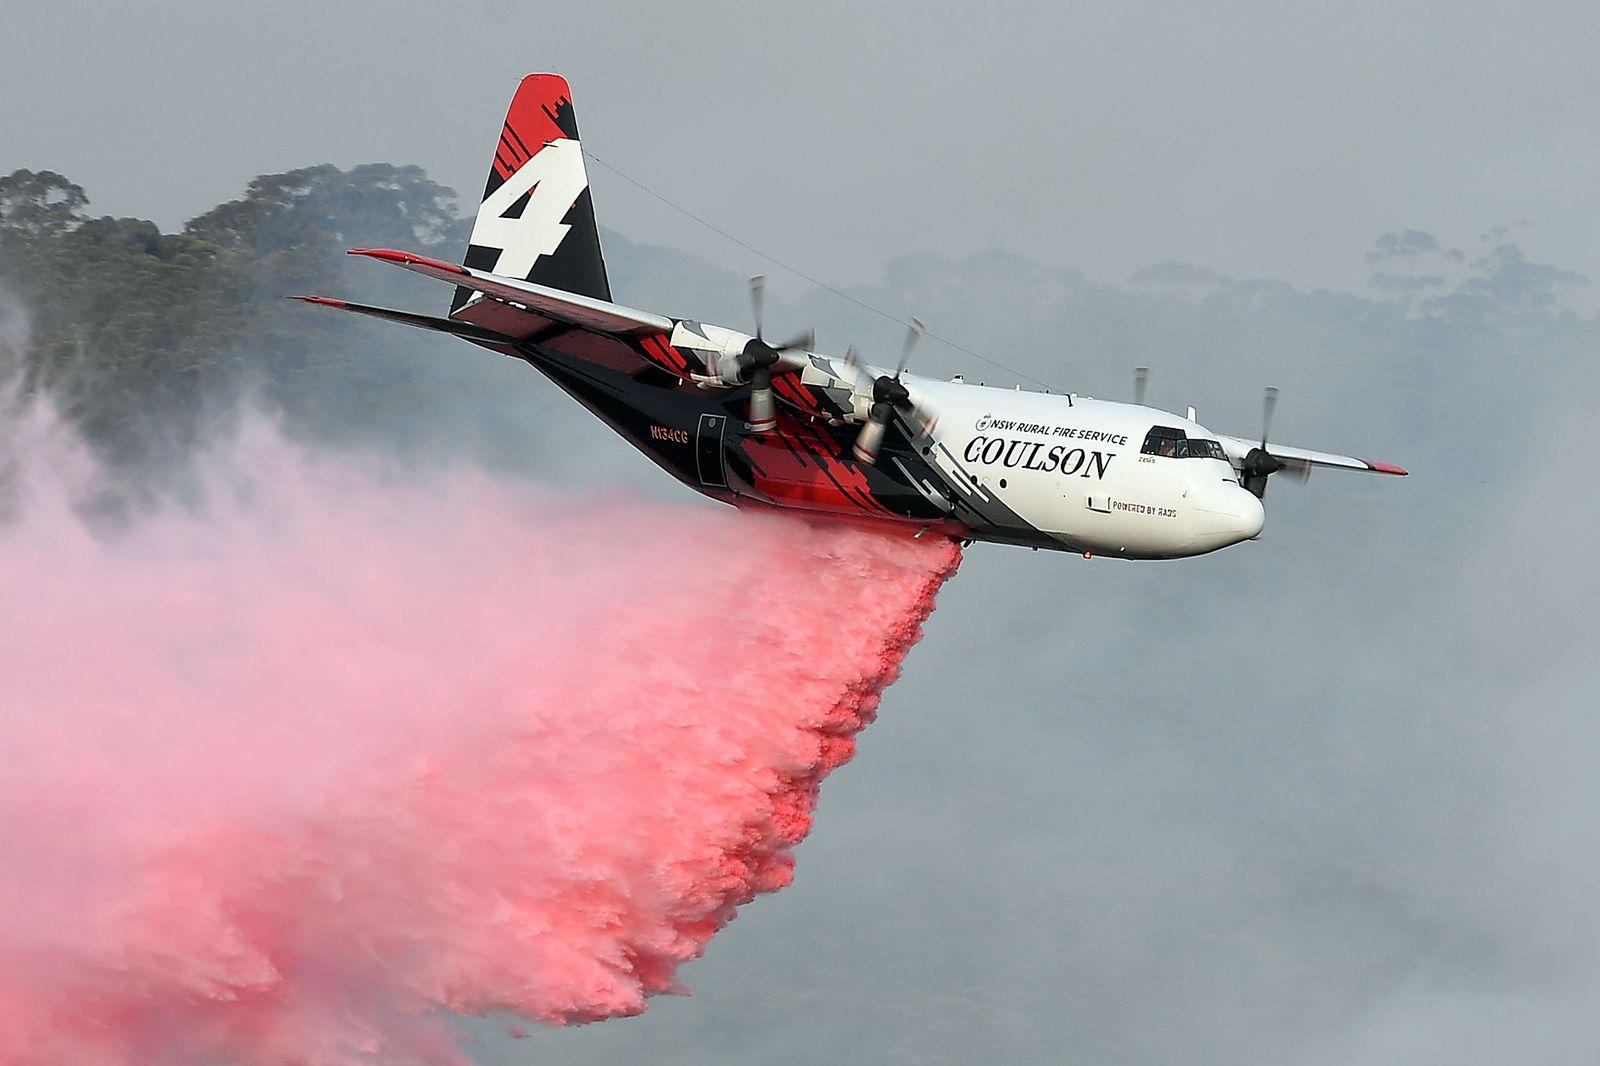 FILES-AUSTRALIA-WEATHER-FIRE-ACCIDENT